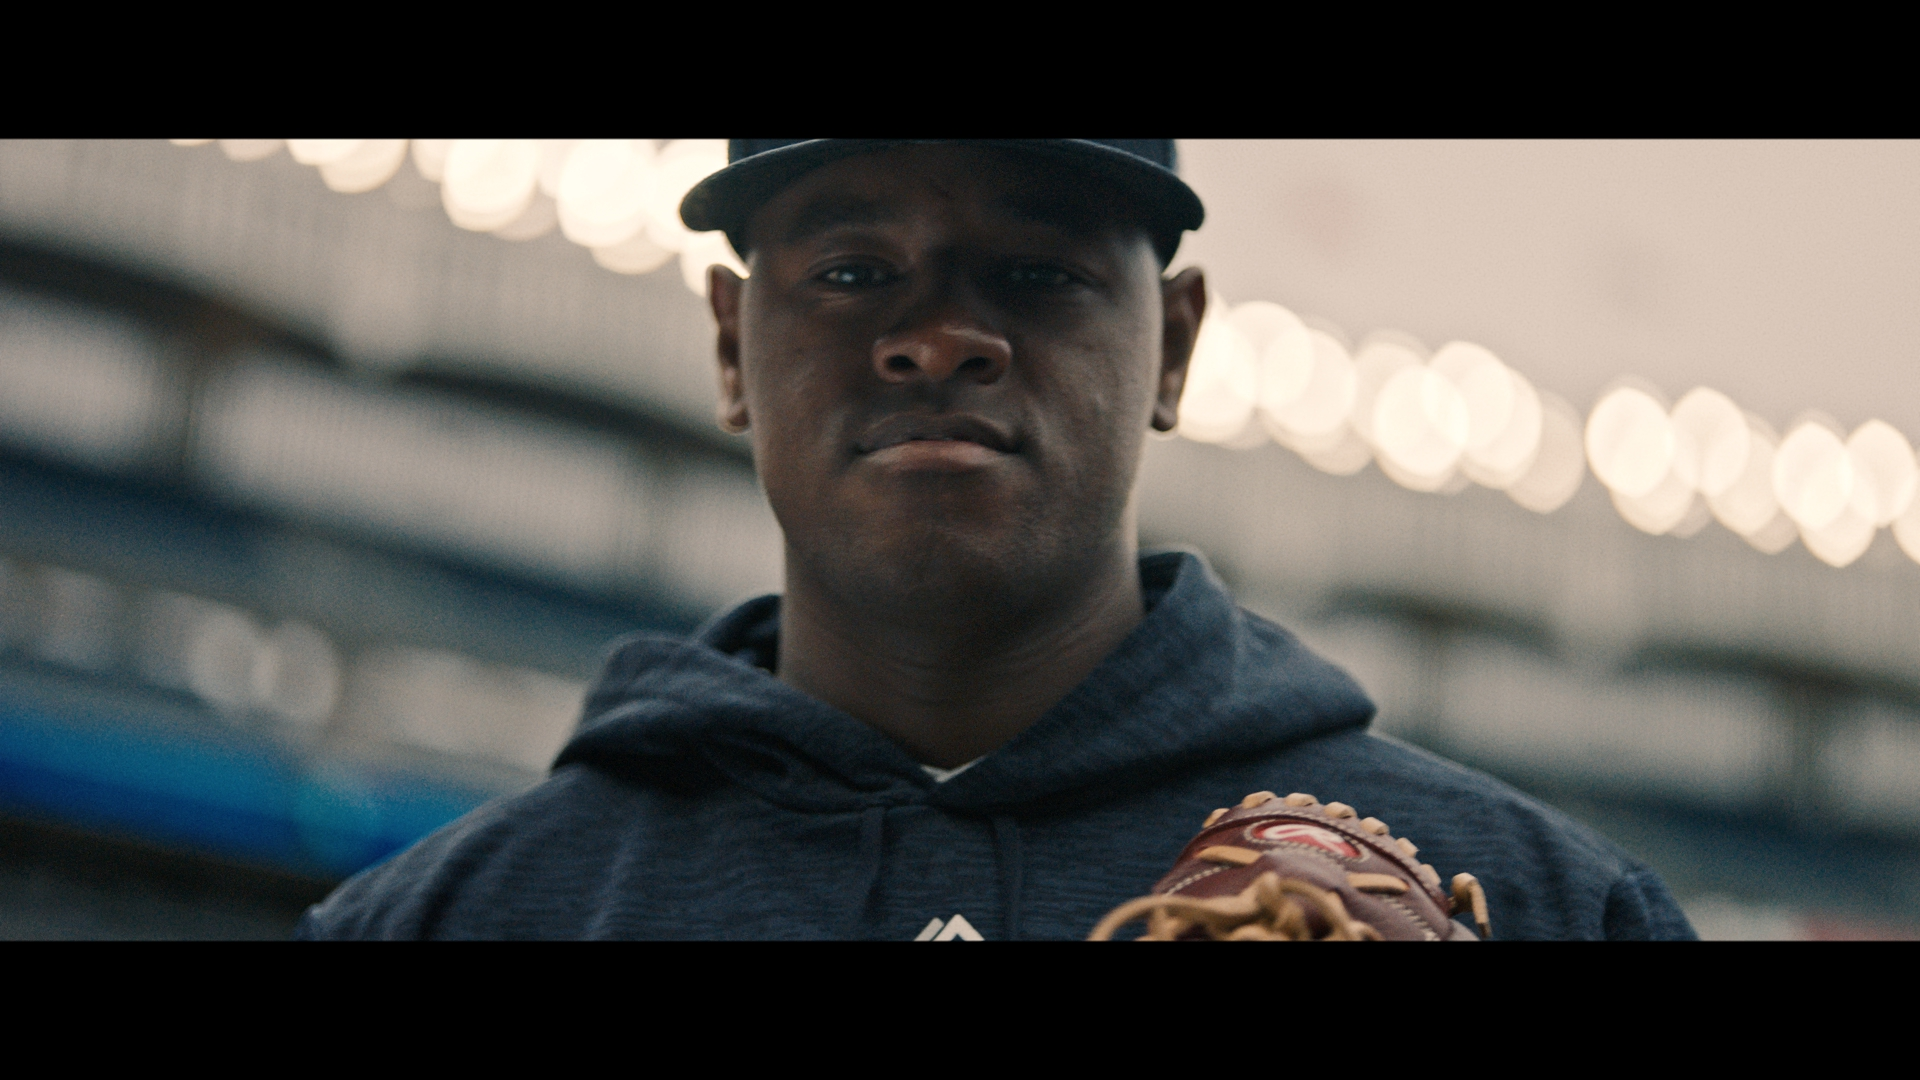 MLB LONDON_1.68.1.JPG